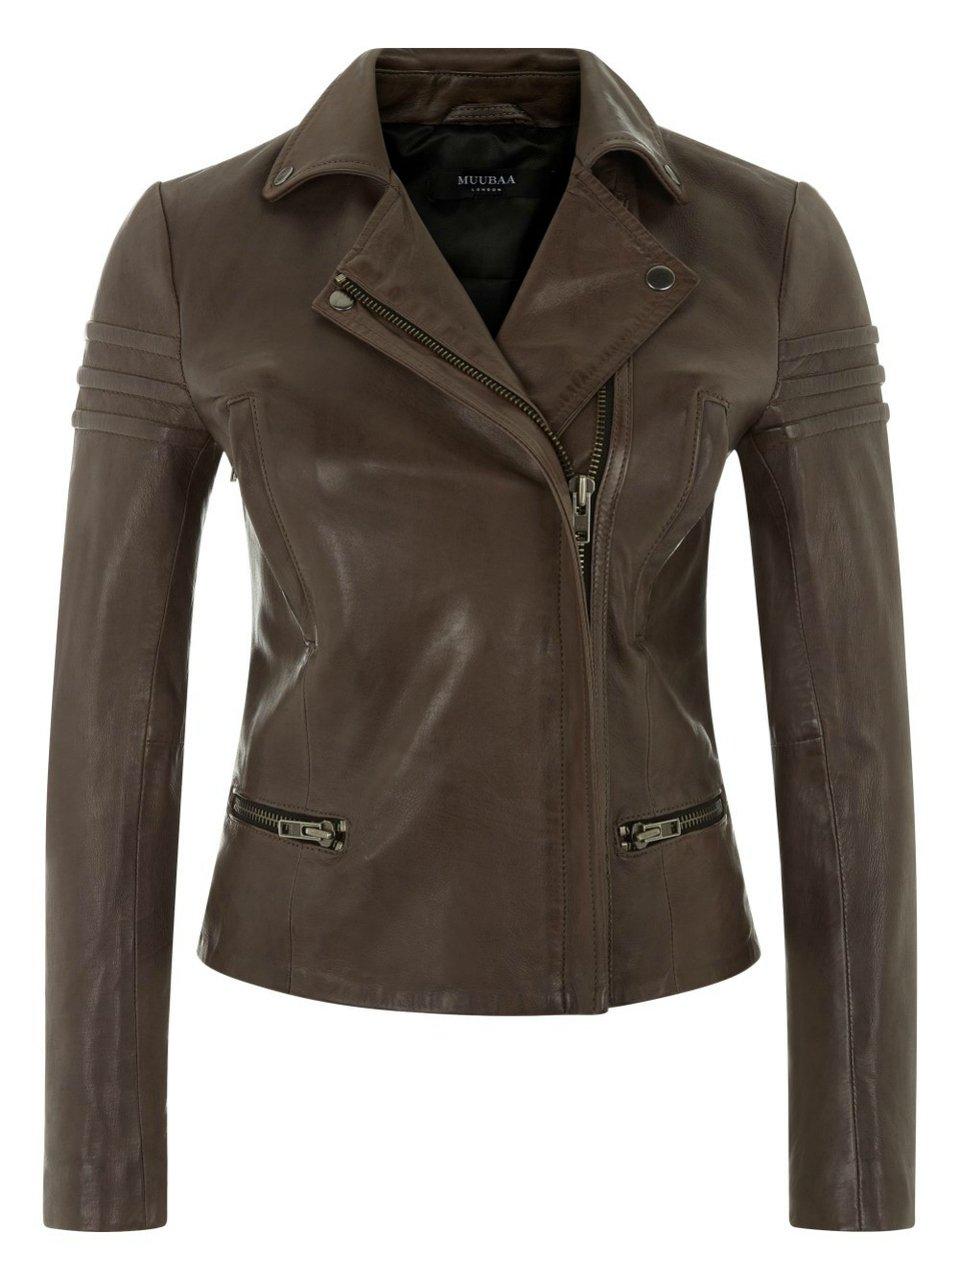 Muubaa Lance Grey Leather Biker Jacket (2) by Muubaa London